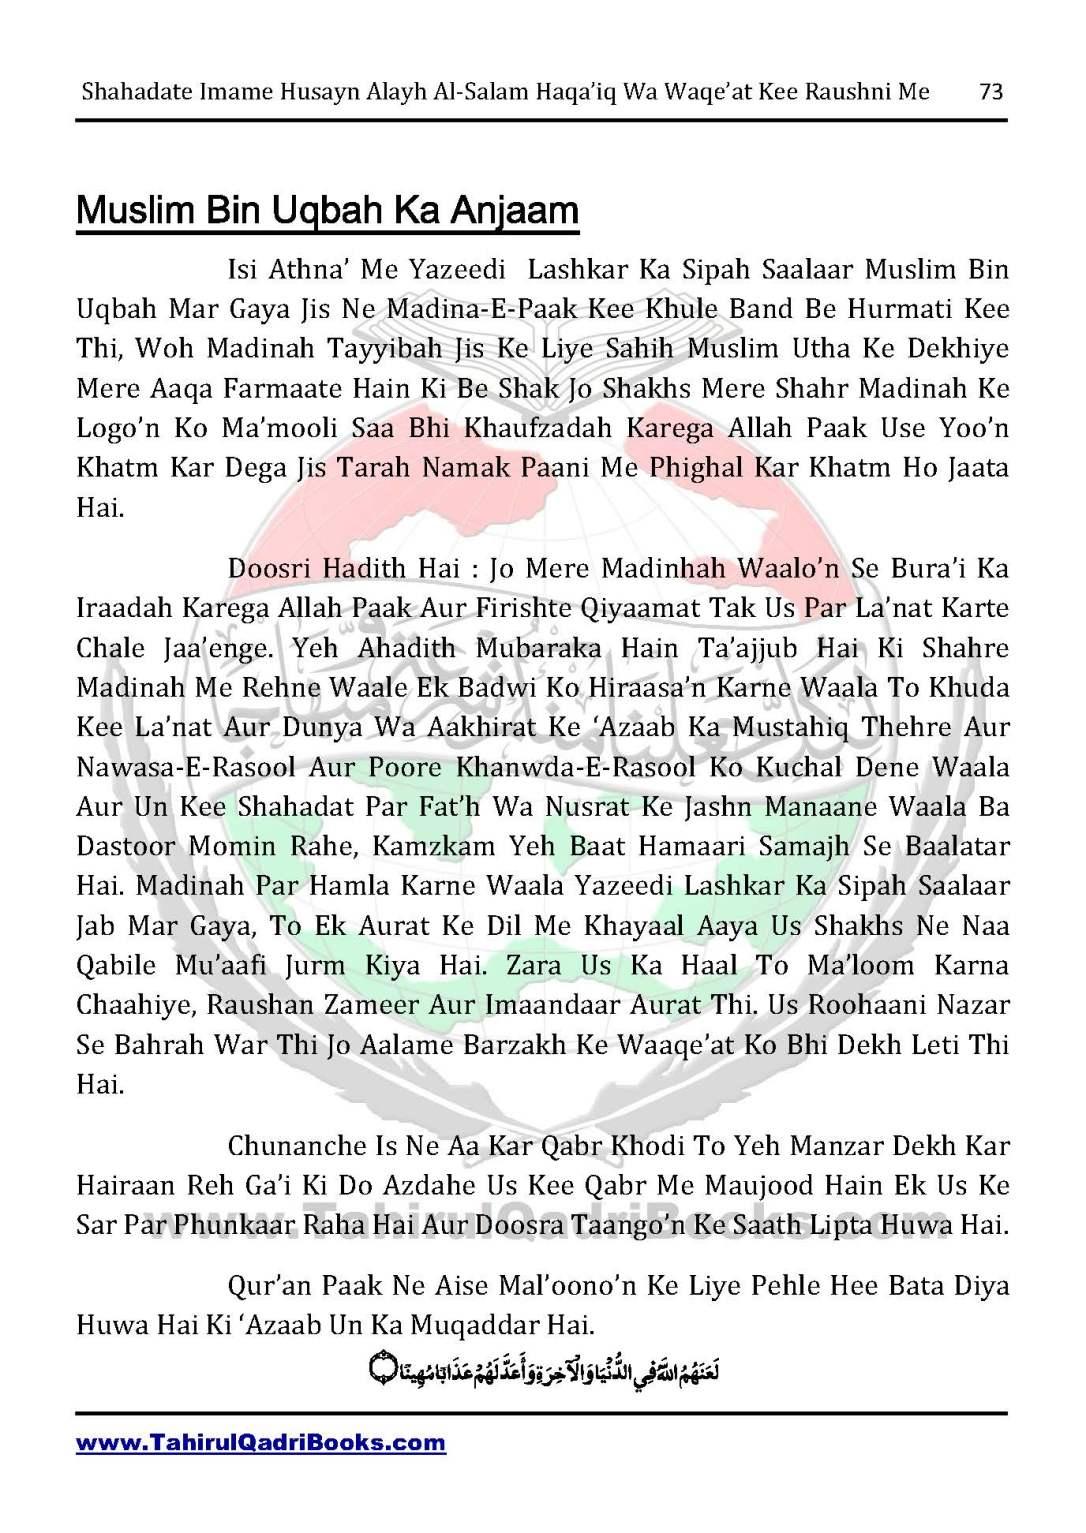 shahadate-imame-husayn-alayh-is-salam-haqaiq-wa-waqe_at-kee-raushni-me-in-roman-urdu-unlocked_Page_73